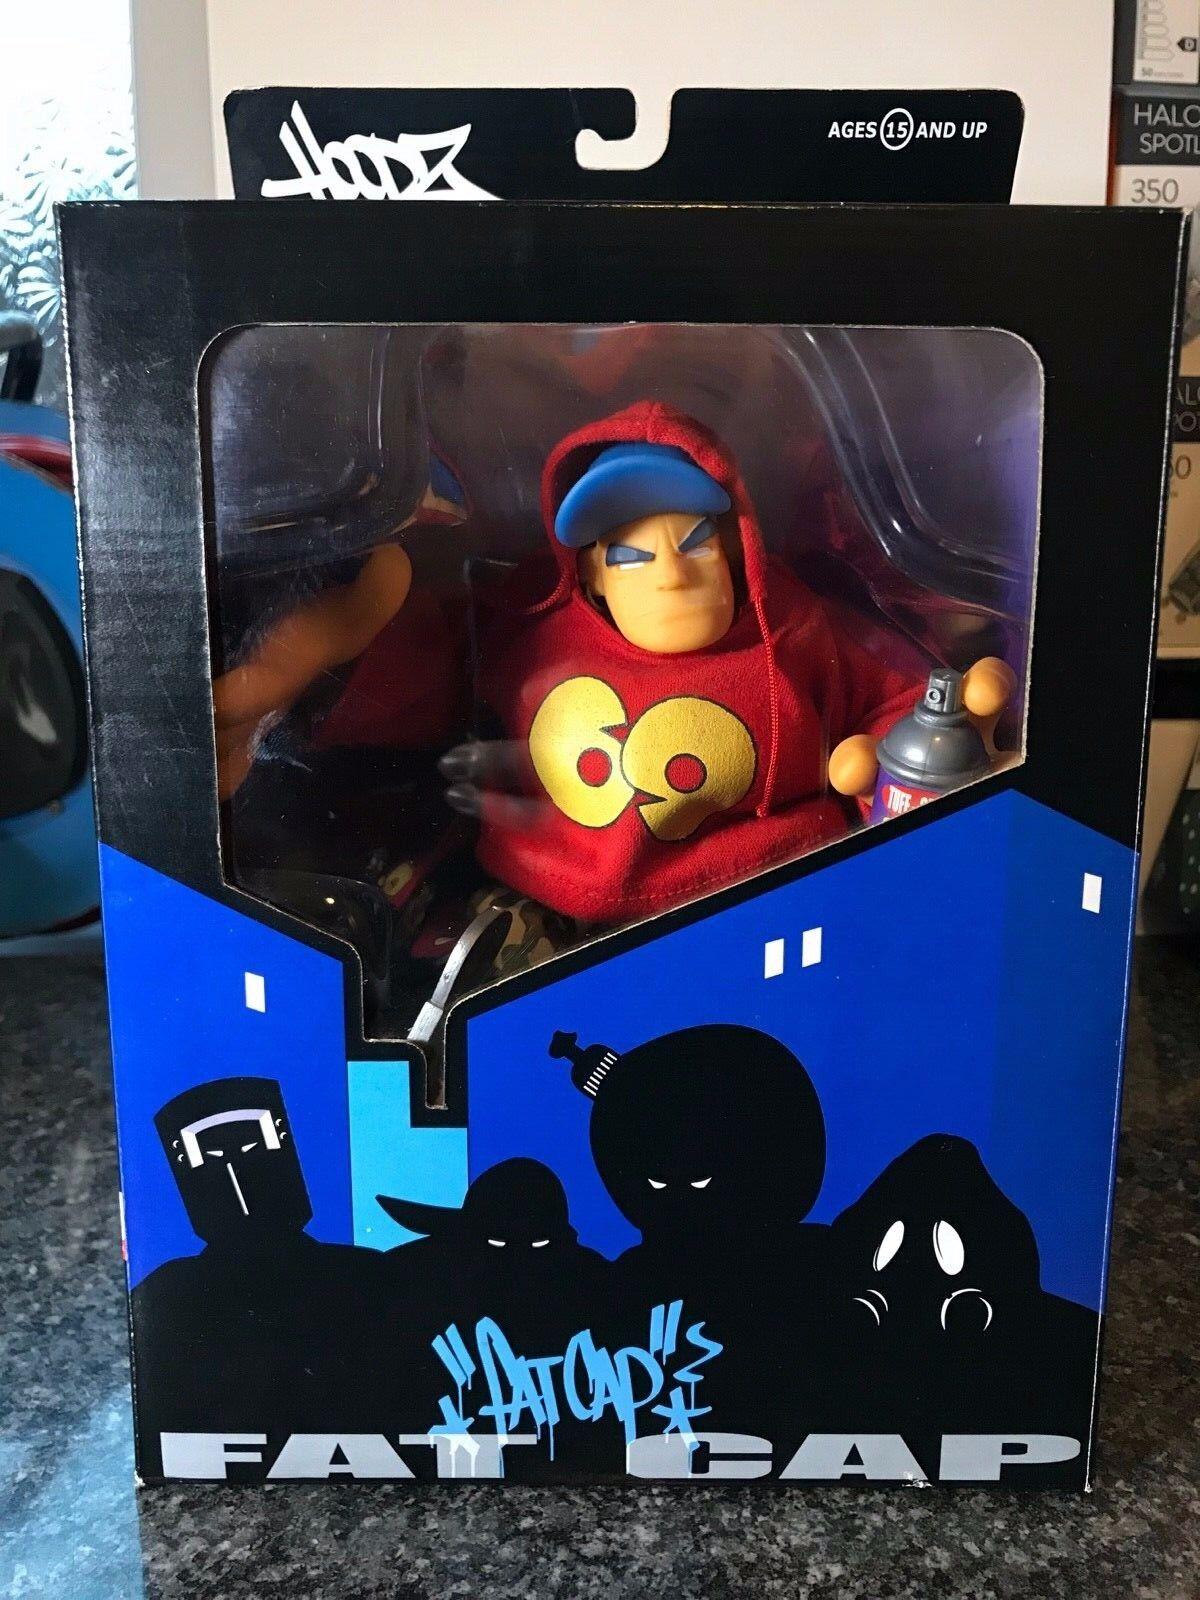 Mezco Hoodz Series 1 Fat Cap, Letterman & Vapor boxed with accessories.